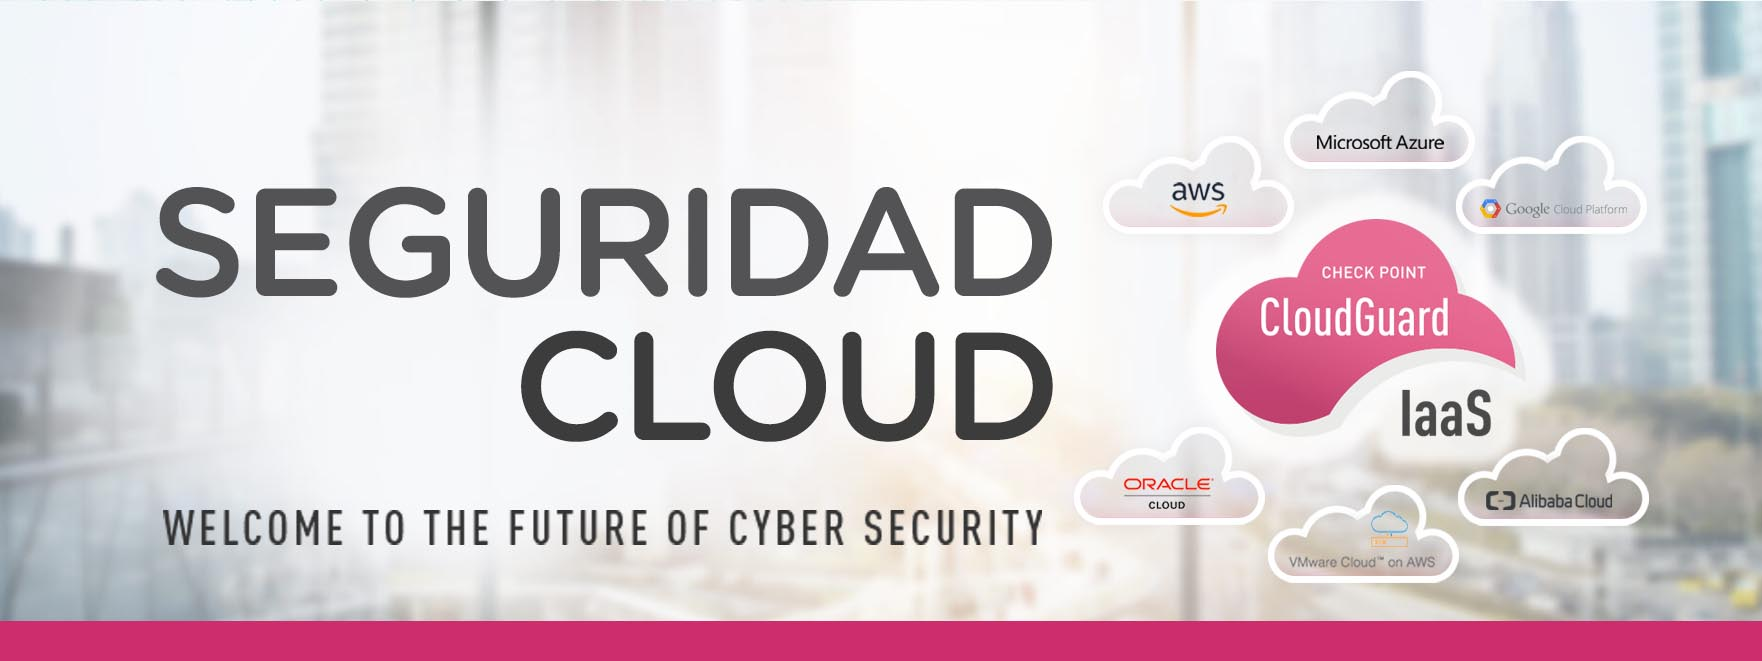 Cloud Securuty seguridad nube cloudguard checkpoint iterati